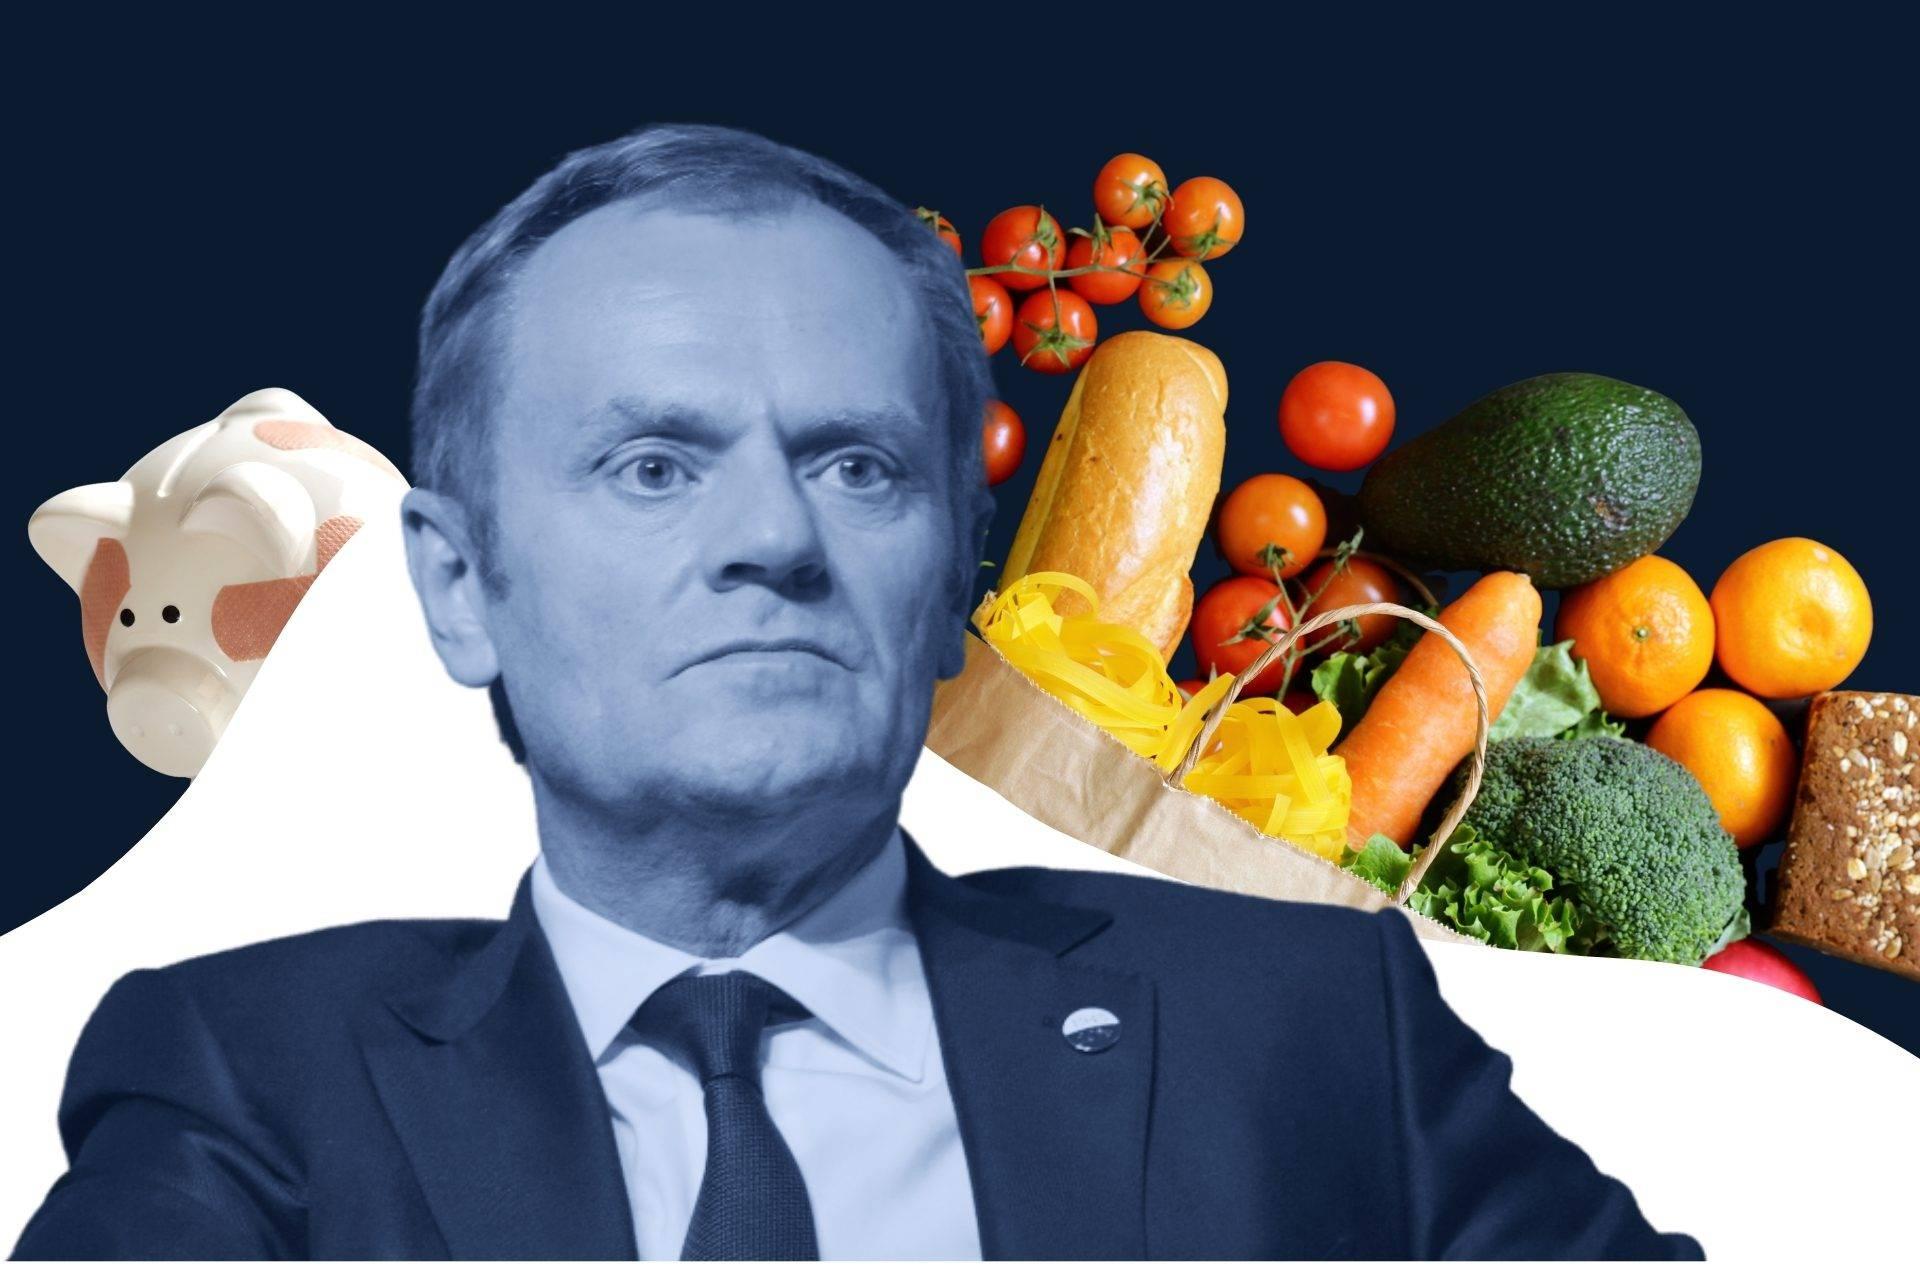 Okłada Tusk i inflacja